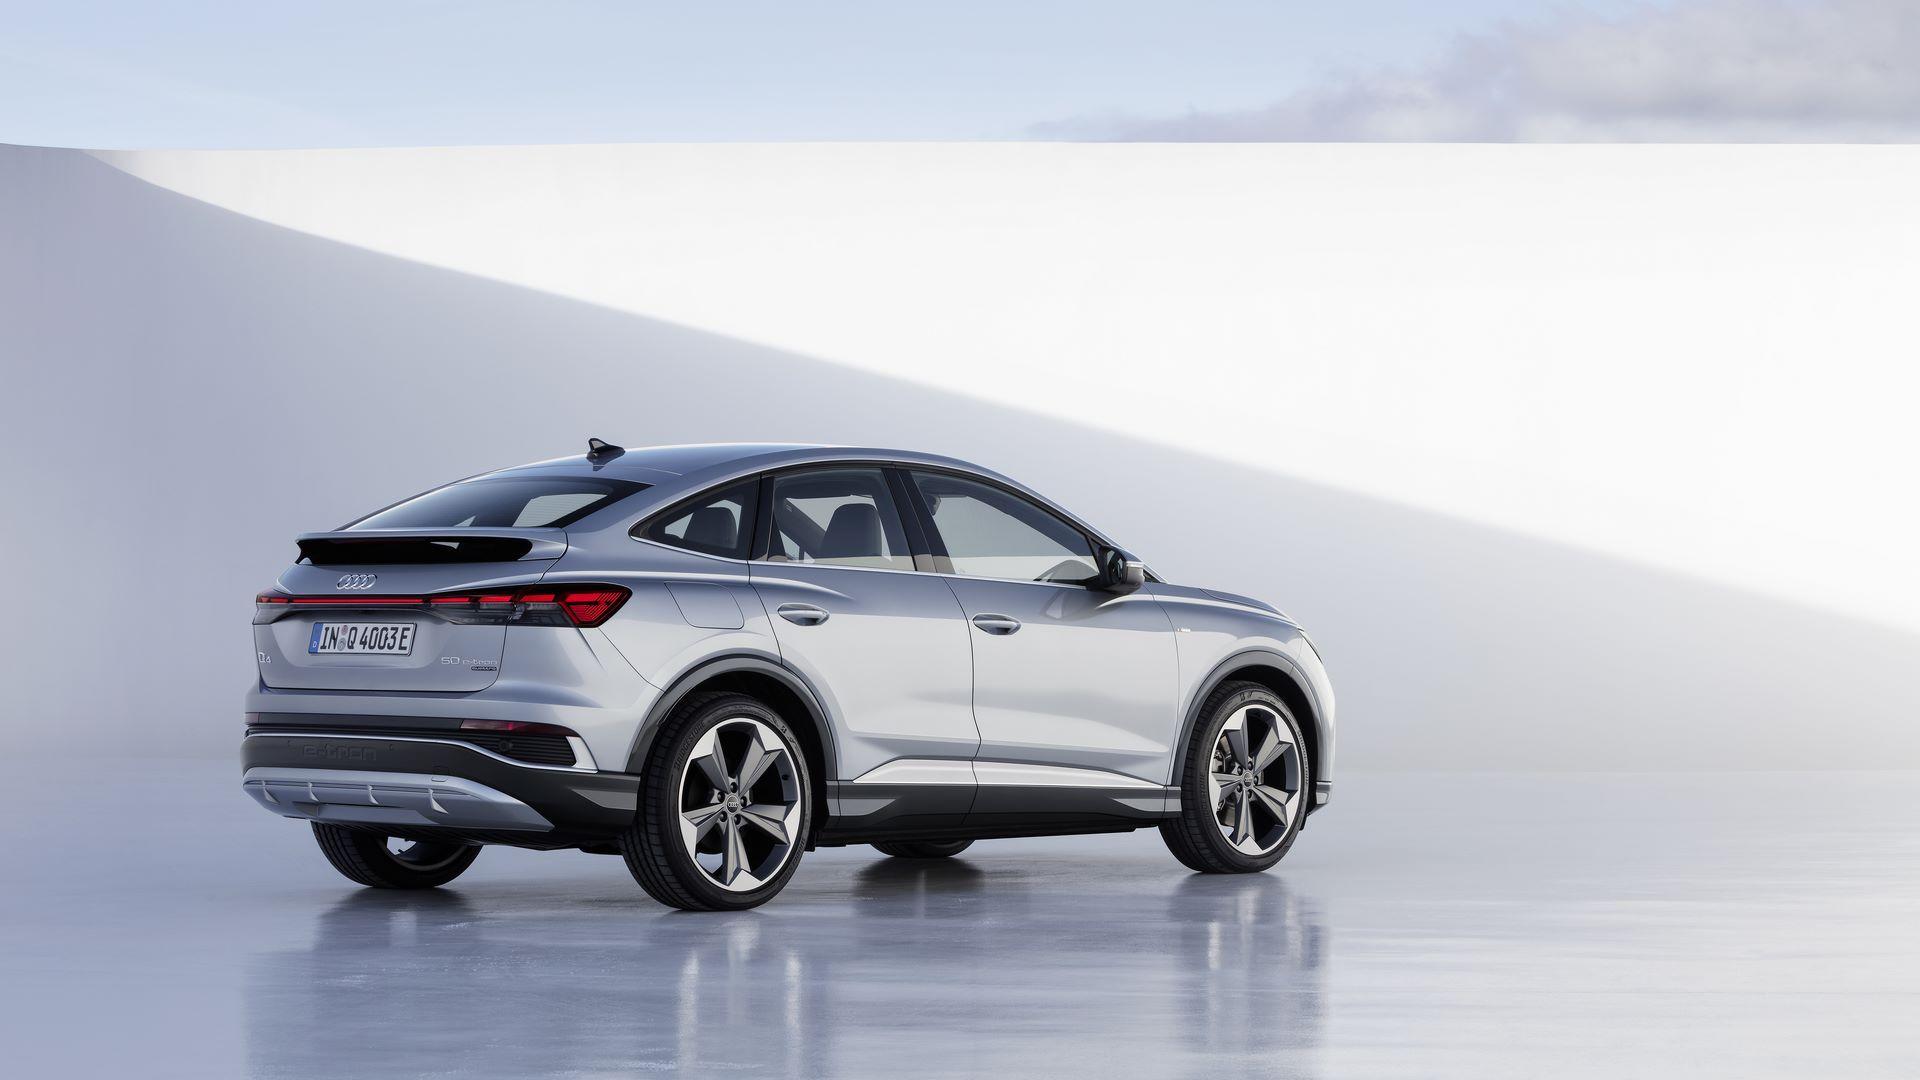 Audi-Q4-e-tron-and-Q4-e-tron-Sportback-34